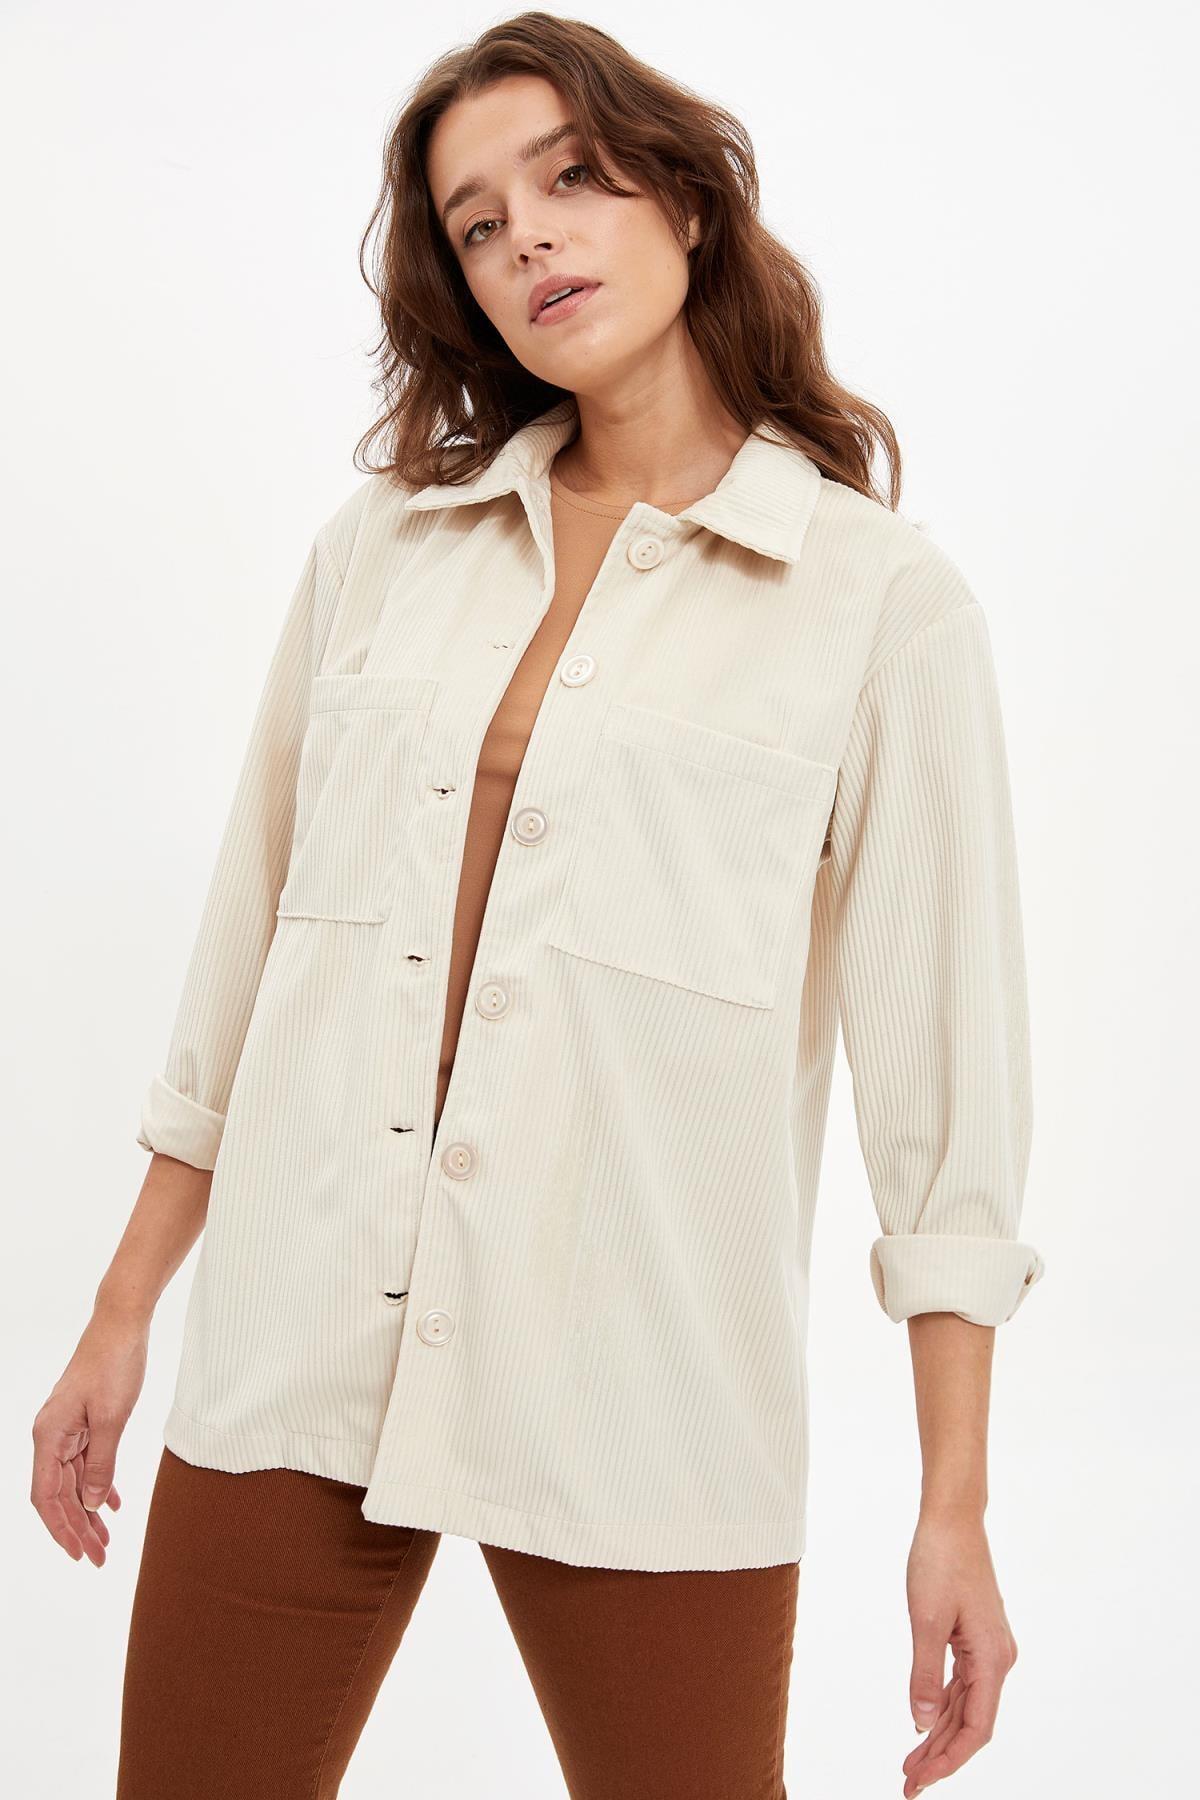 DeFacto Kadın Cep Detaylı Relax Fit Gömlek Tunik